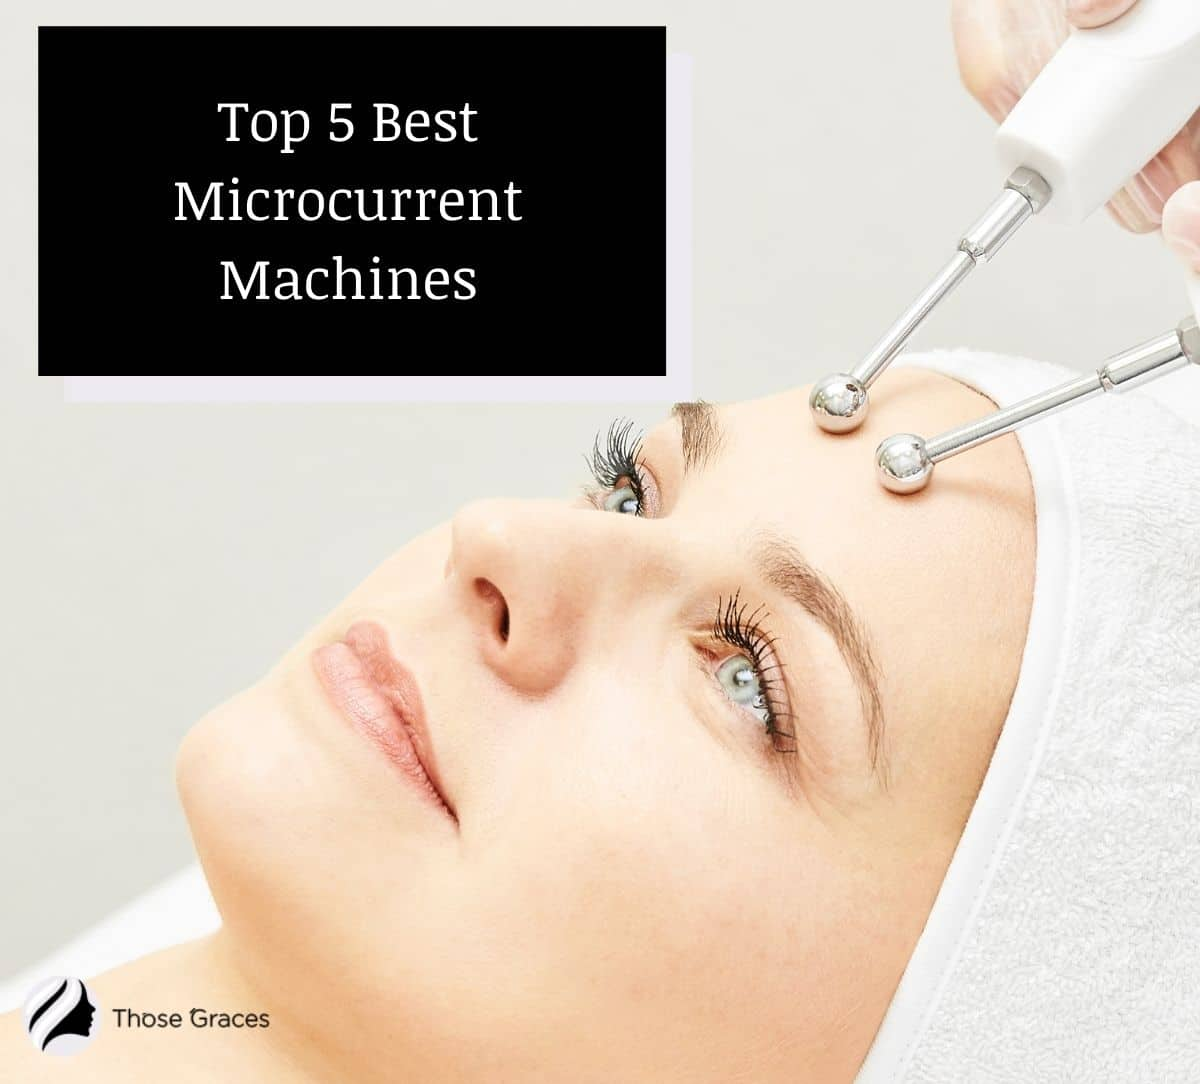 lady having her microcurrent machine treatment